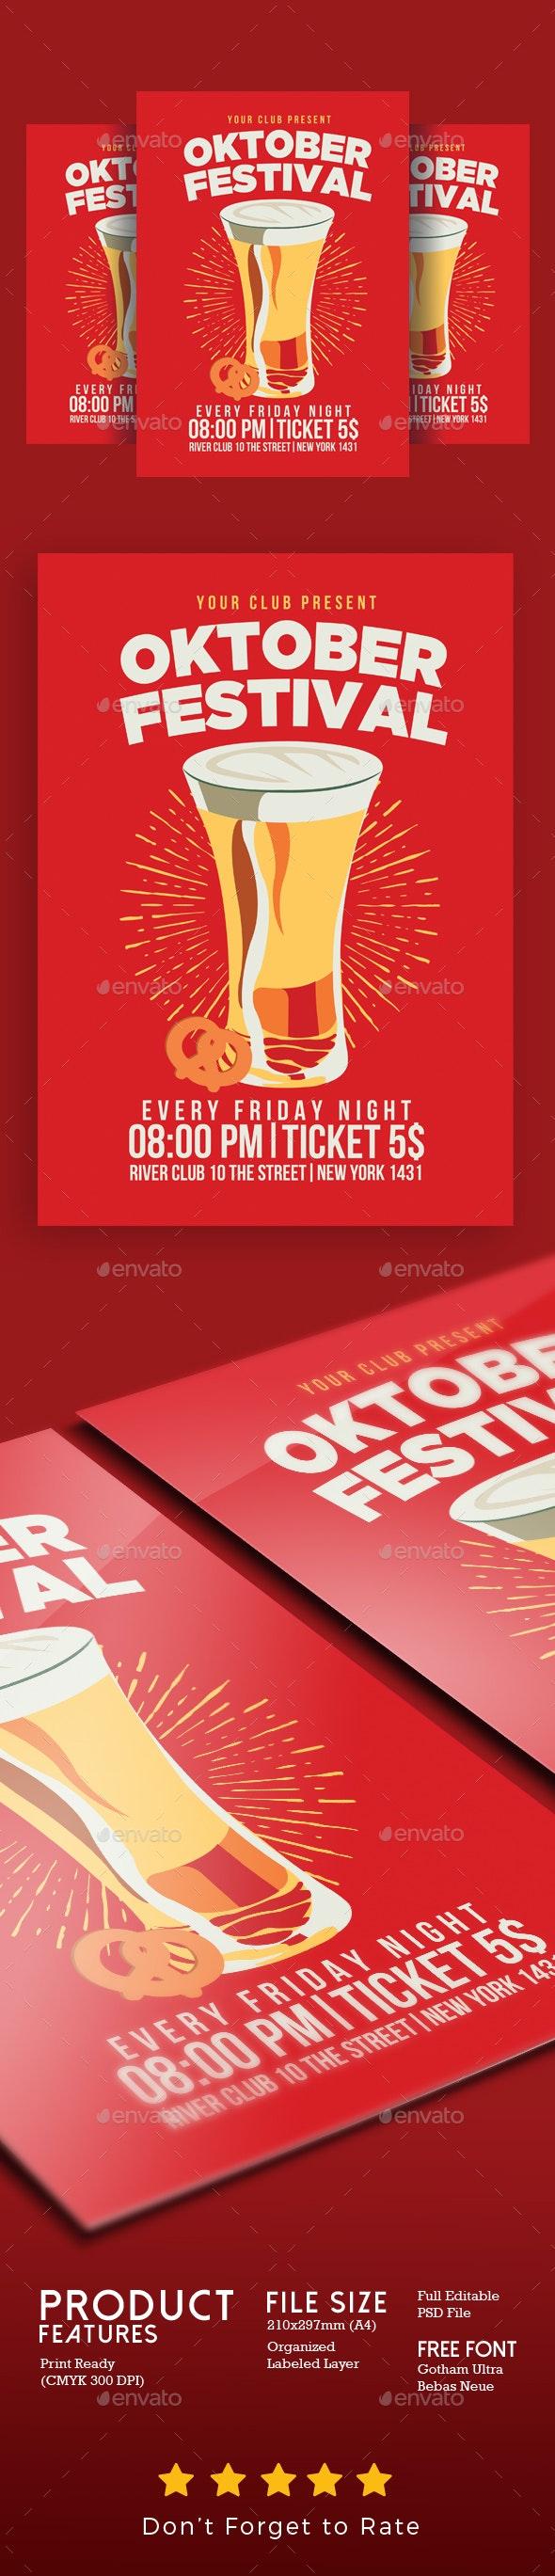 Oktober Fest Flyer Vintage Style - Clubs & Parties Events